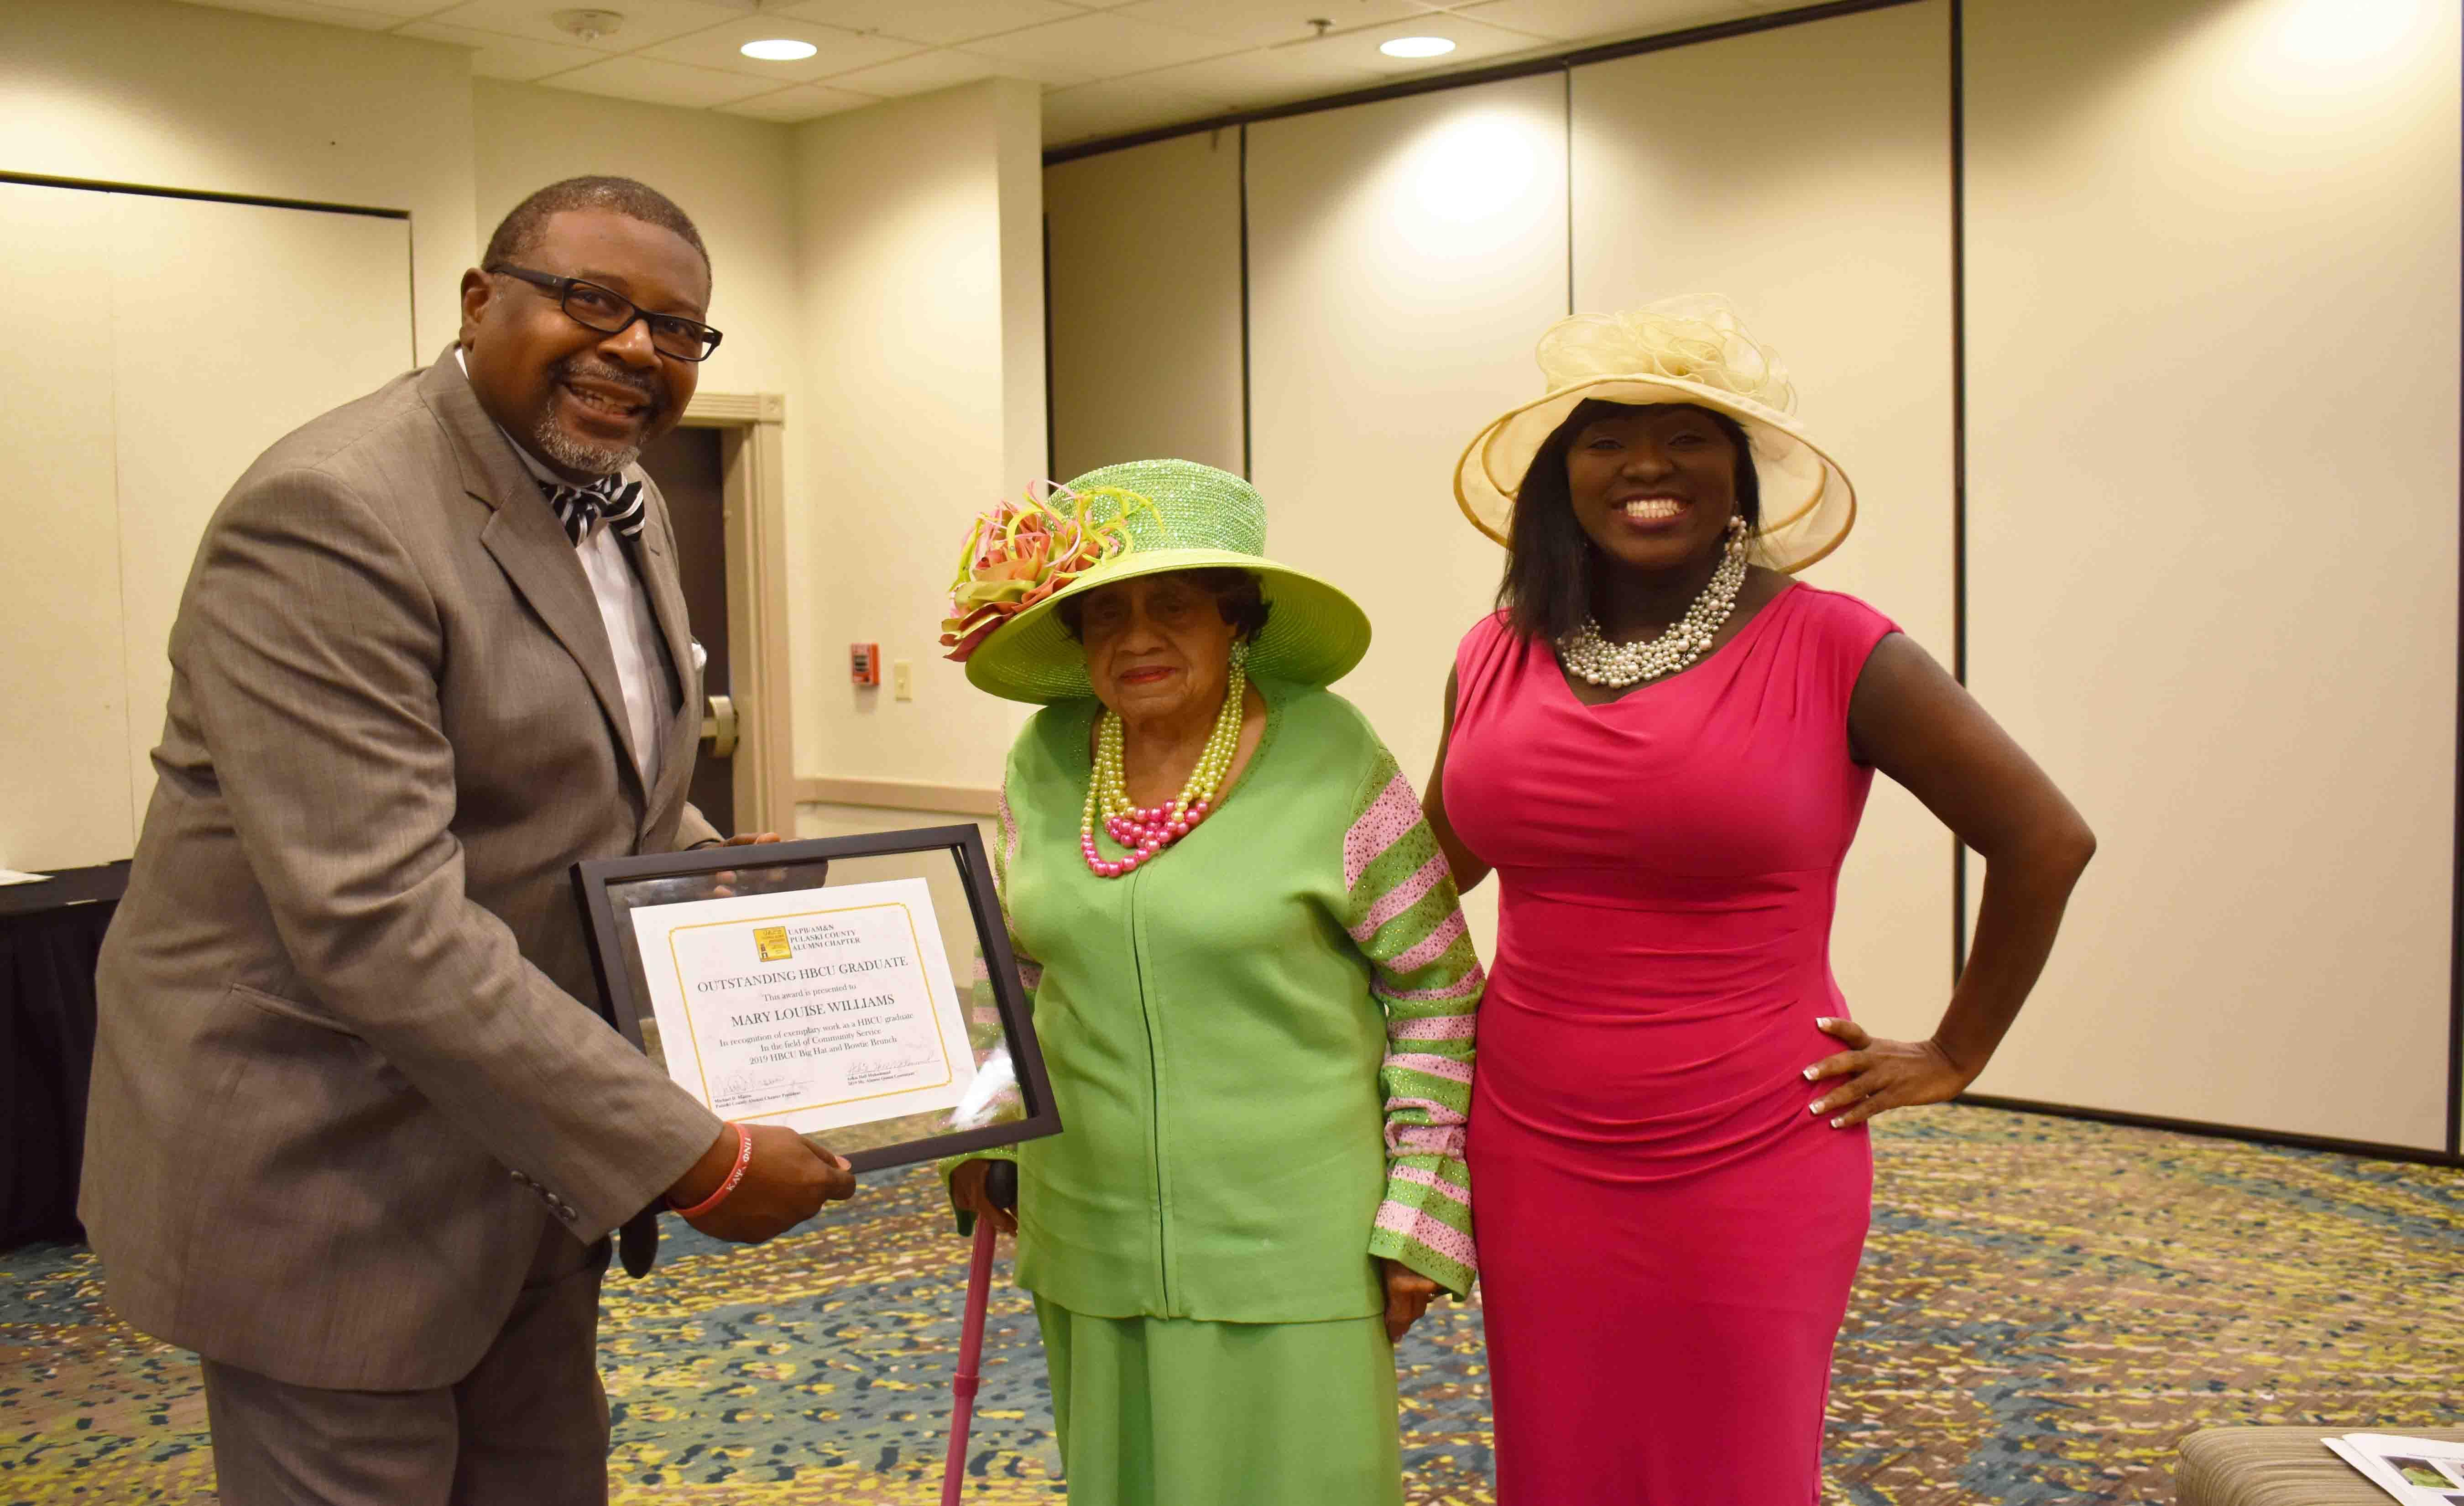 UAPB/AM&N Pulaski County Alumni Chapter President,Michael Mason, Mary Louise Williams, Ashia Muhammad (UAPB/AM&N Pulaski County Chapter Ms. Alumni Queen Contestant)